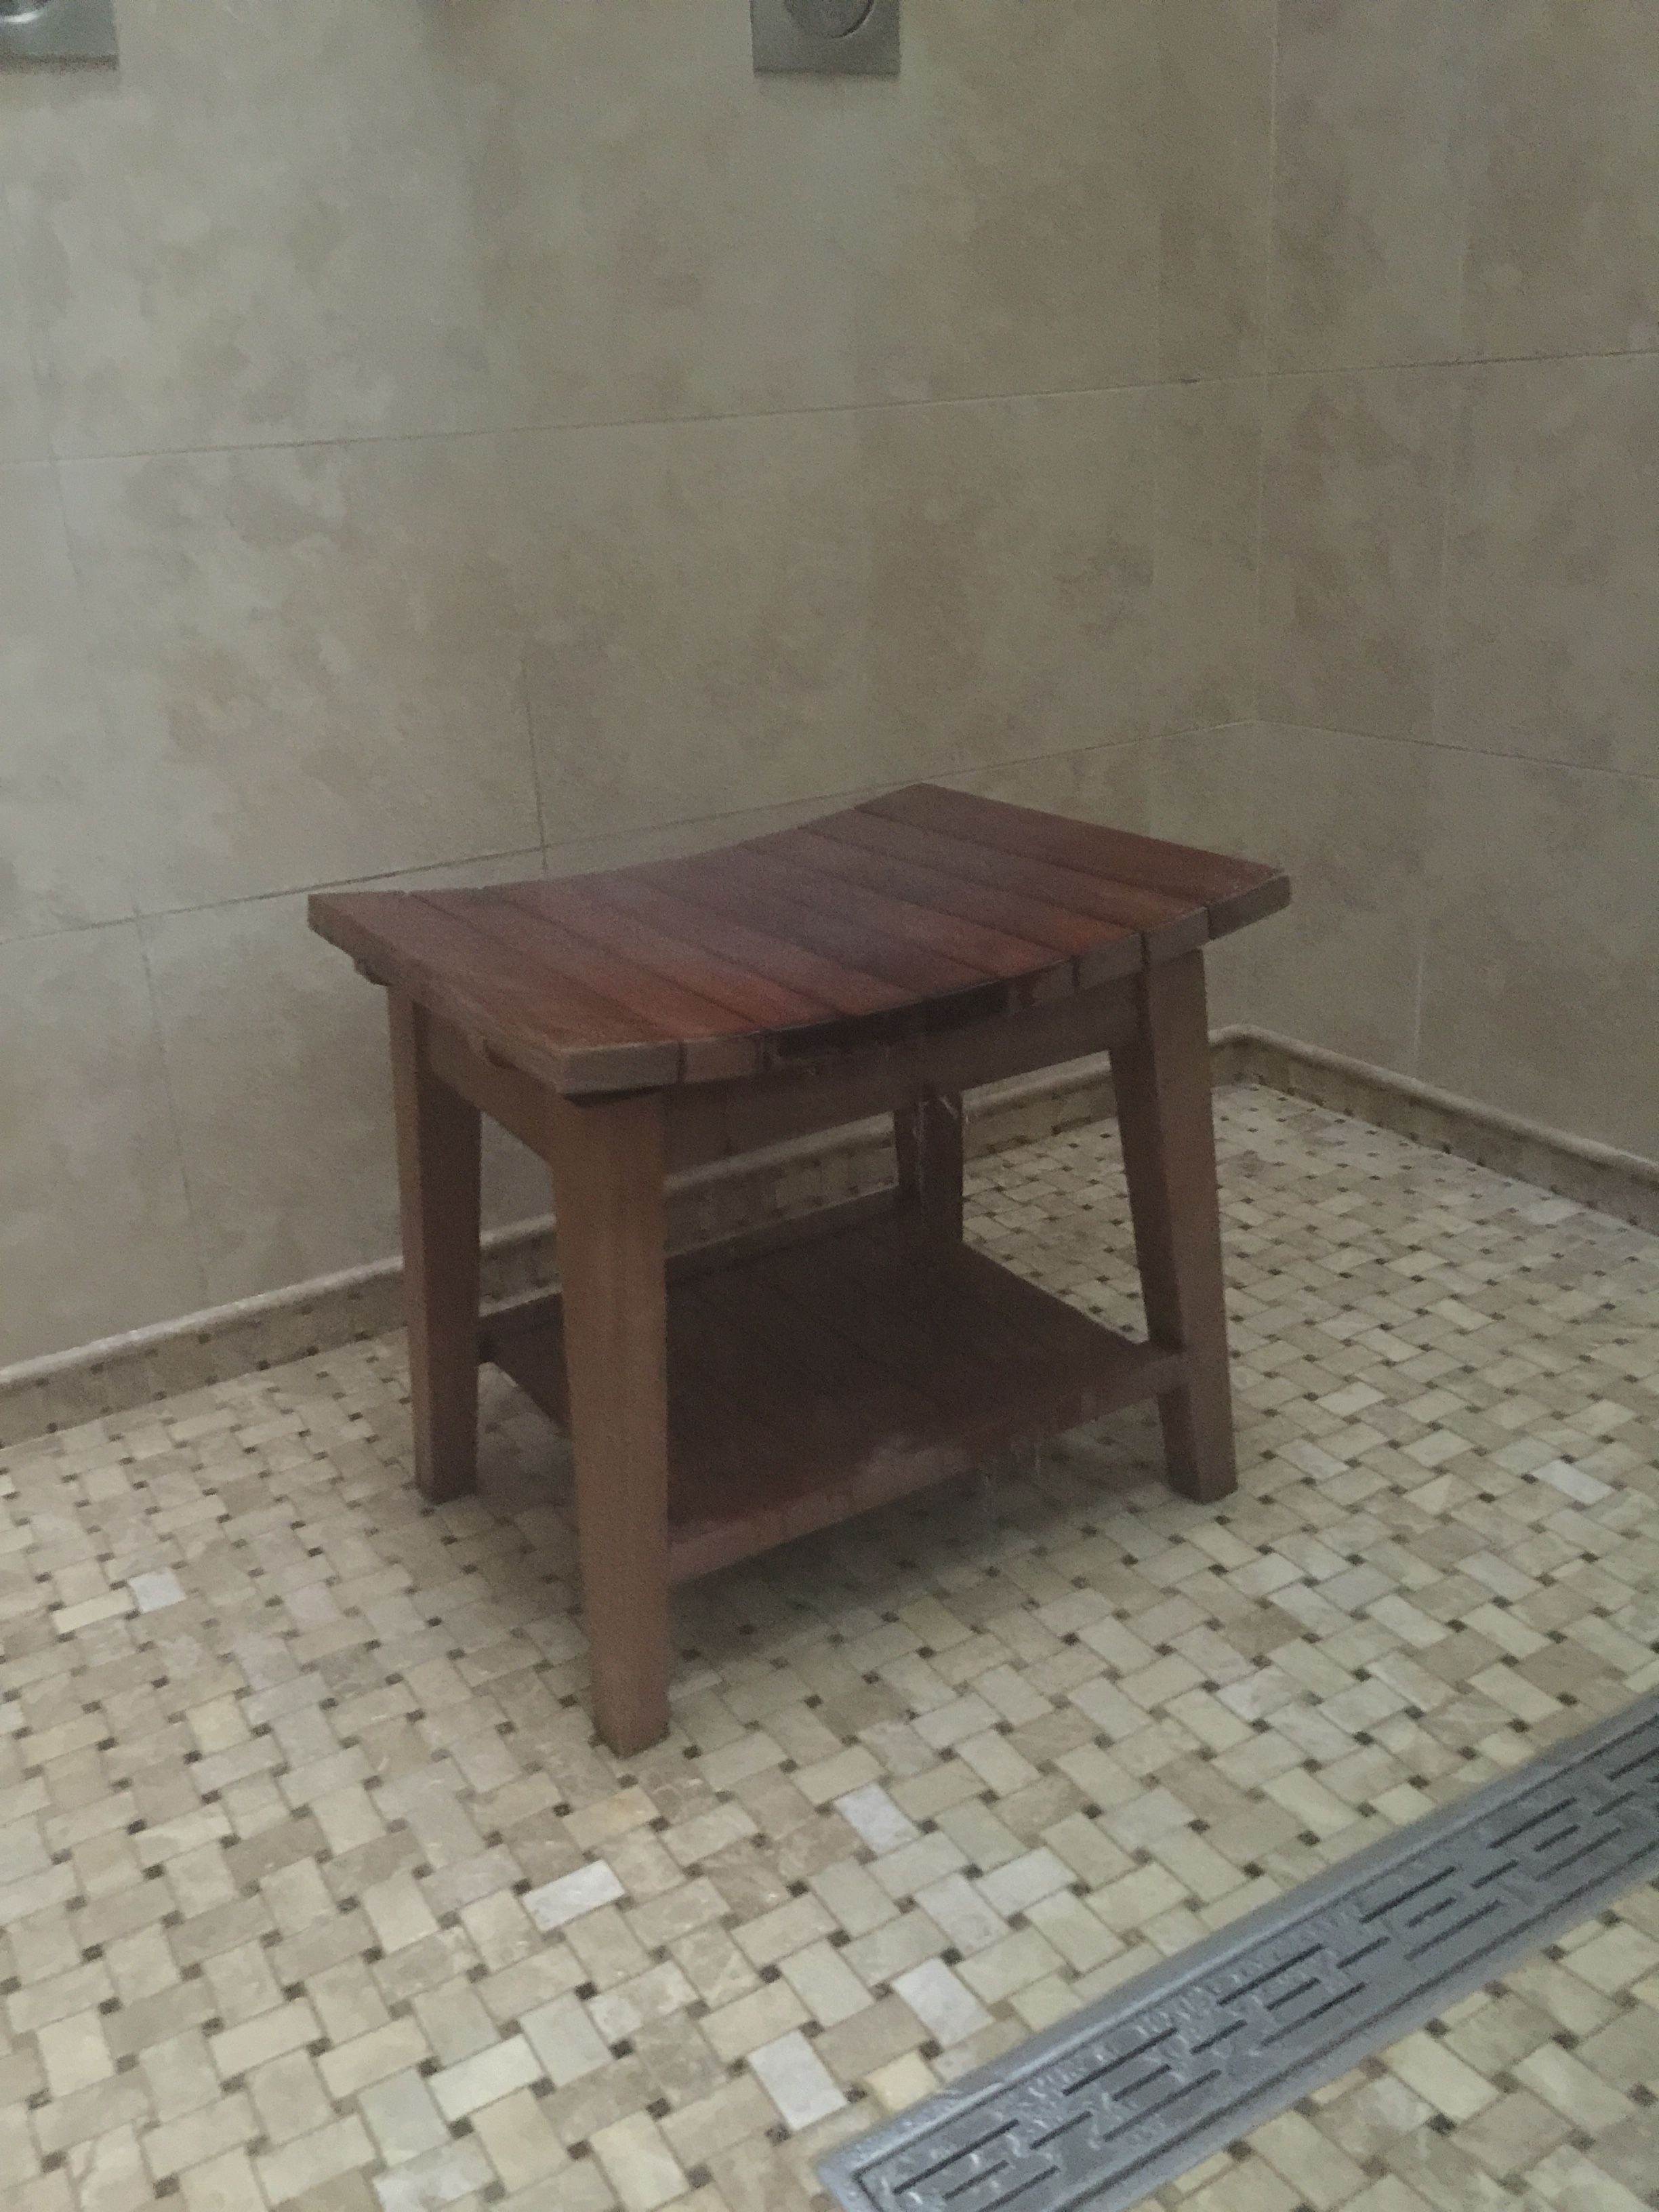 An Ipe Shower Bench Outdoor Decor